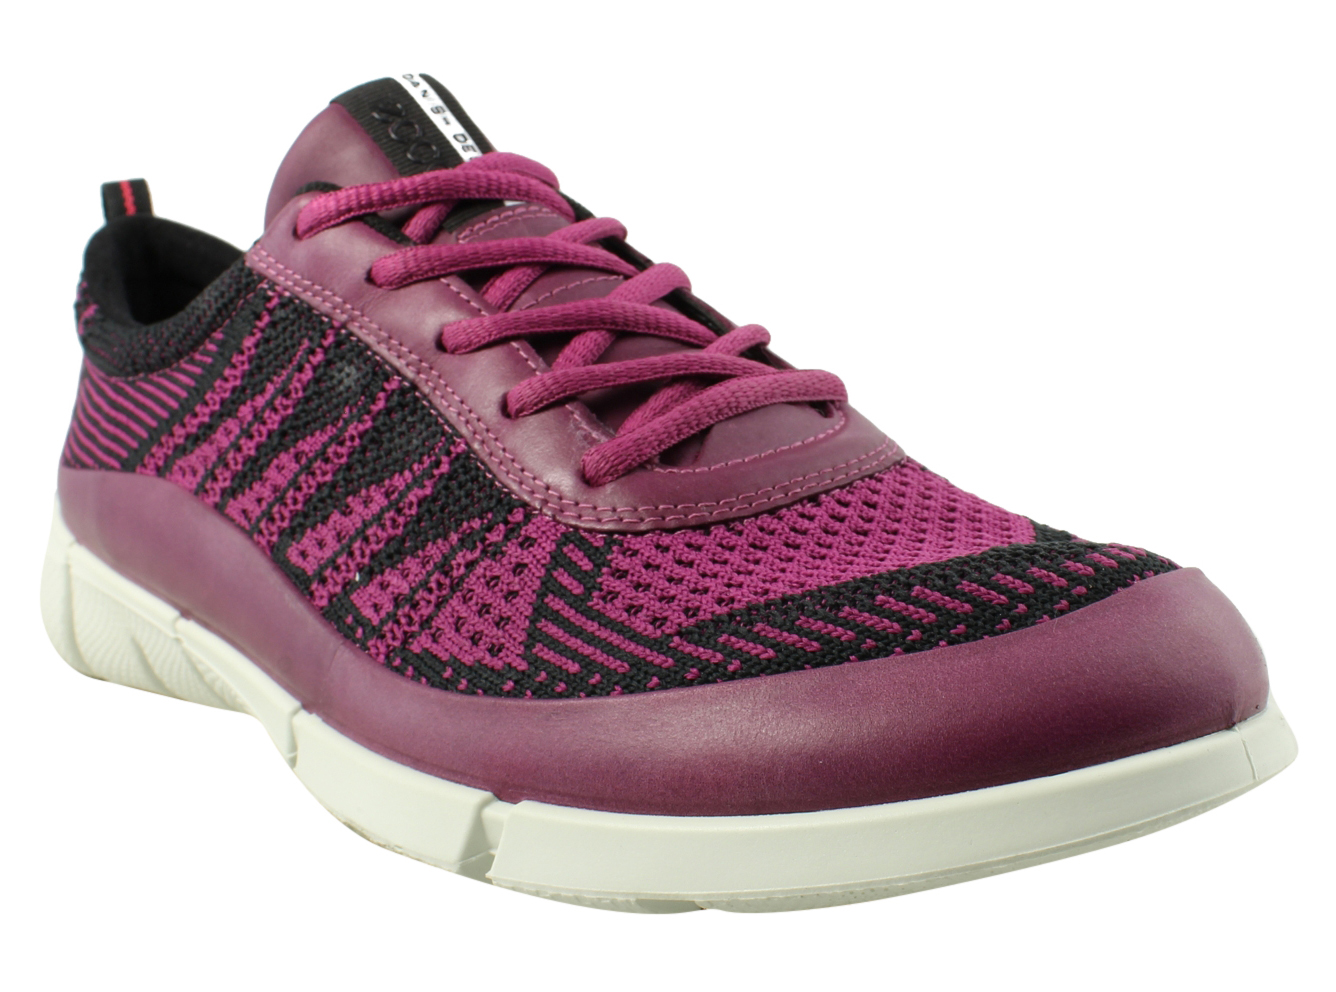 ECCO Womens Intrinsic 1 Fuchsia Fuchsia Running Shoes Size 11.5 New by Ecco